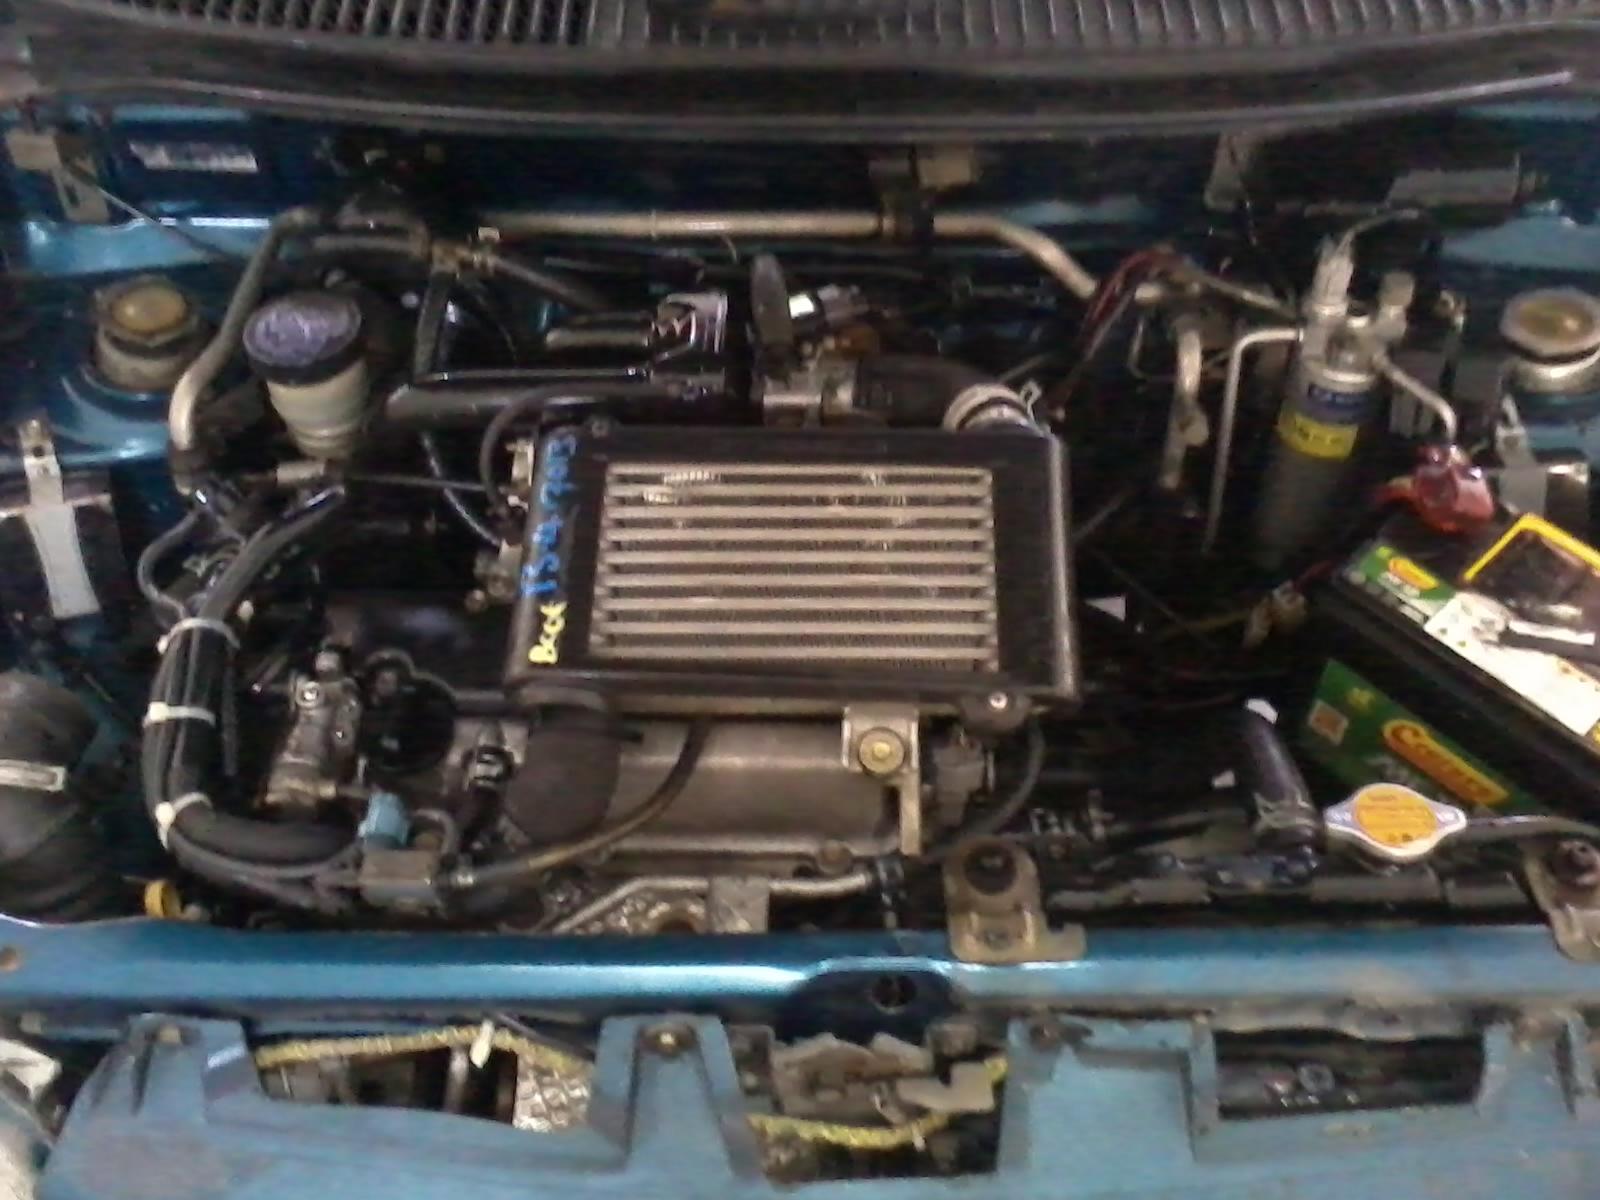 Daihatsu Mira L7 Wiring Diagram Schematics Diagrams Engine Cool Perodua Kancil Photos Best Image Copen 2018